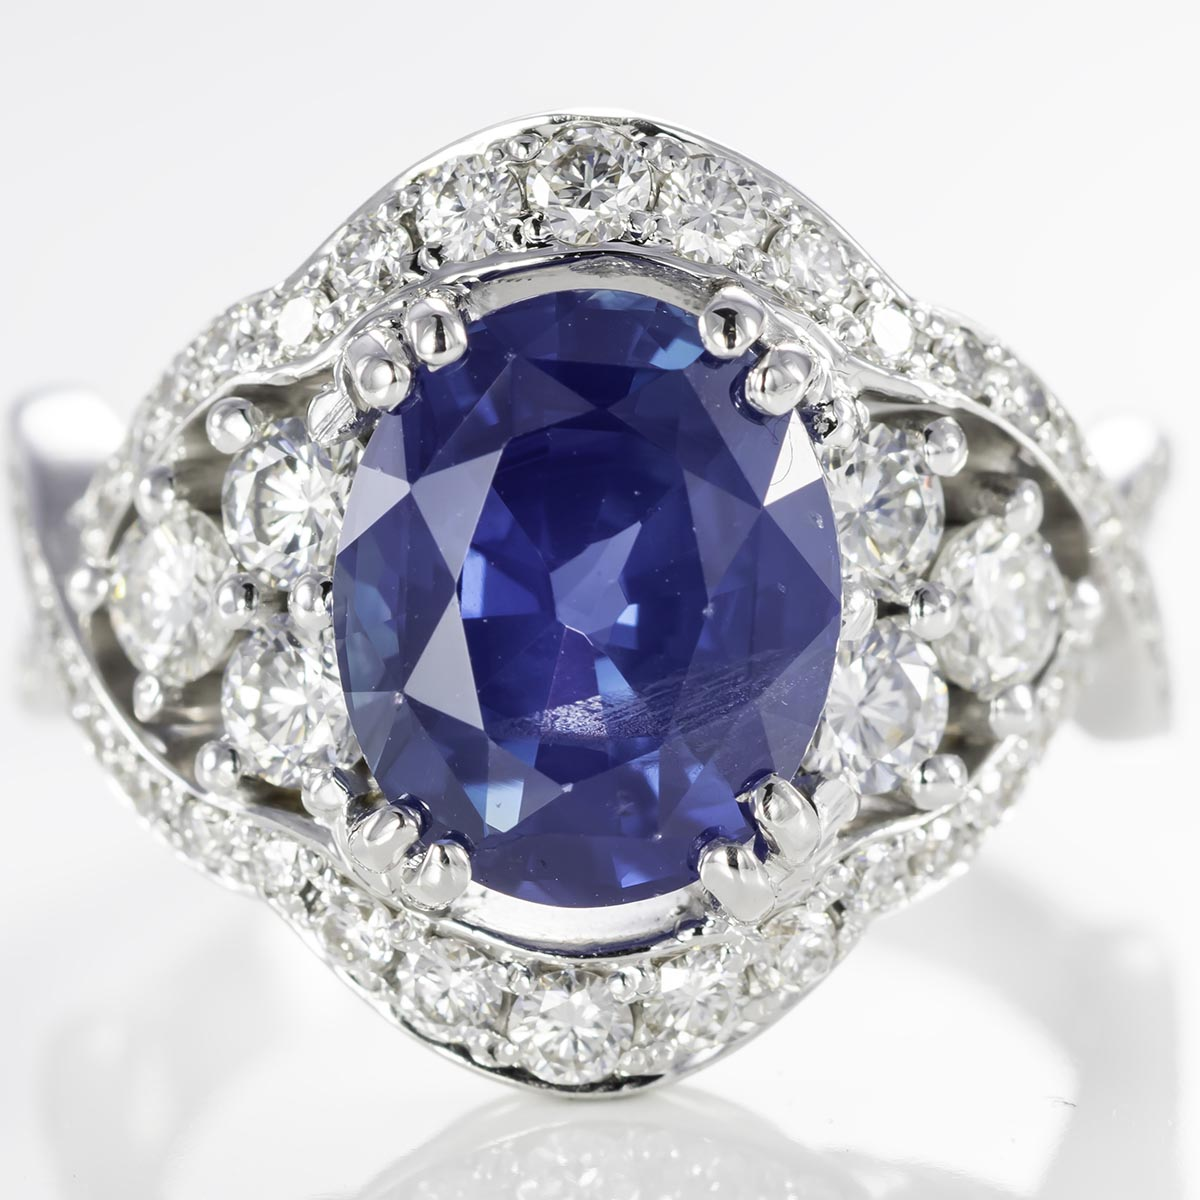 jewelry_5-before1.jpg